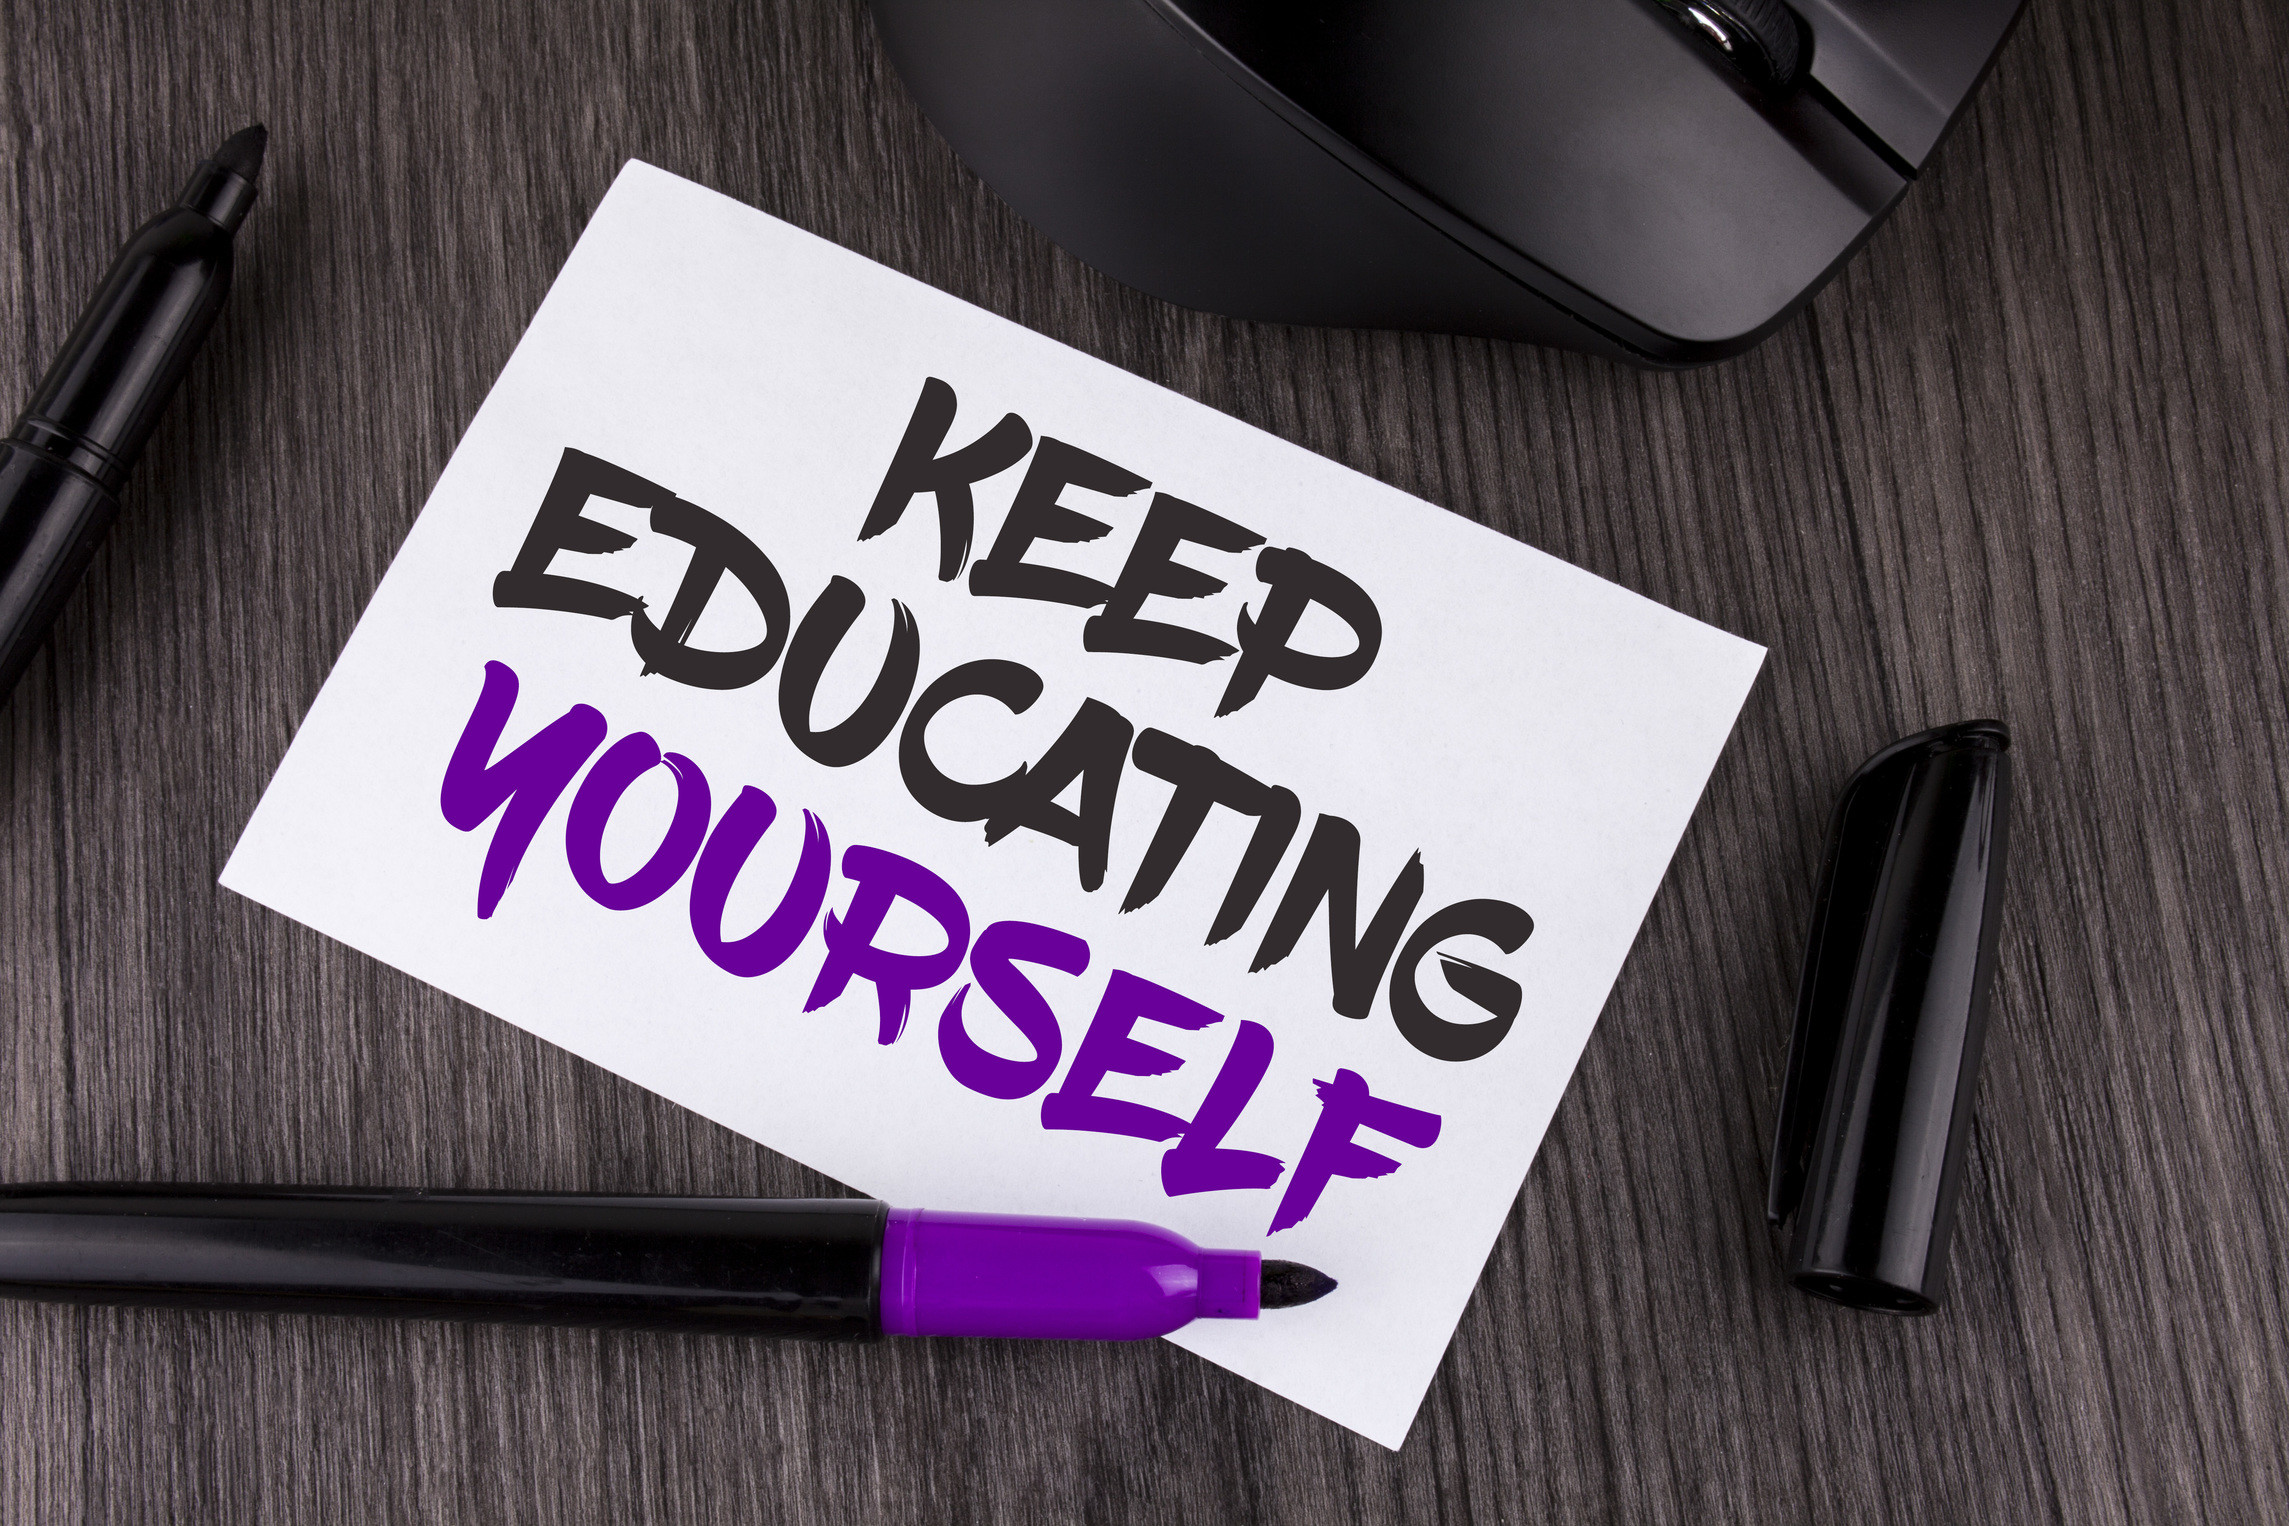 Keep Educating Yourself (Original)